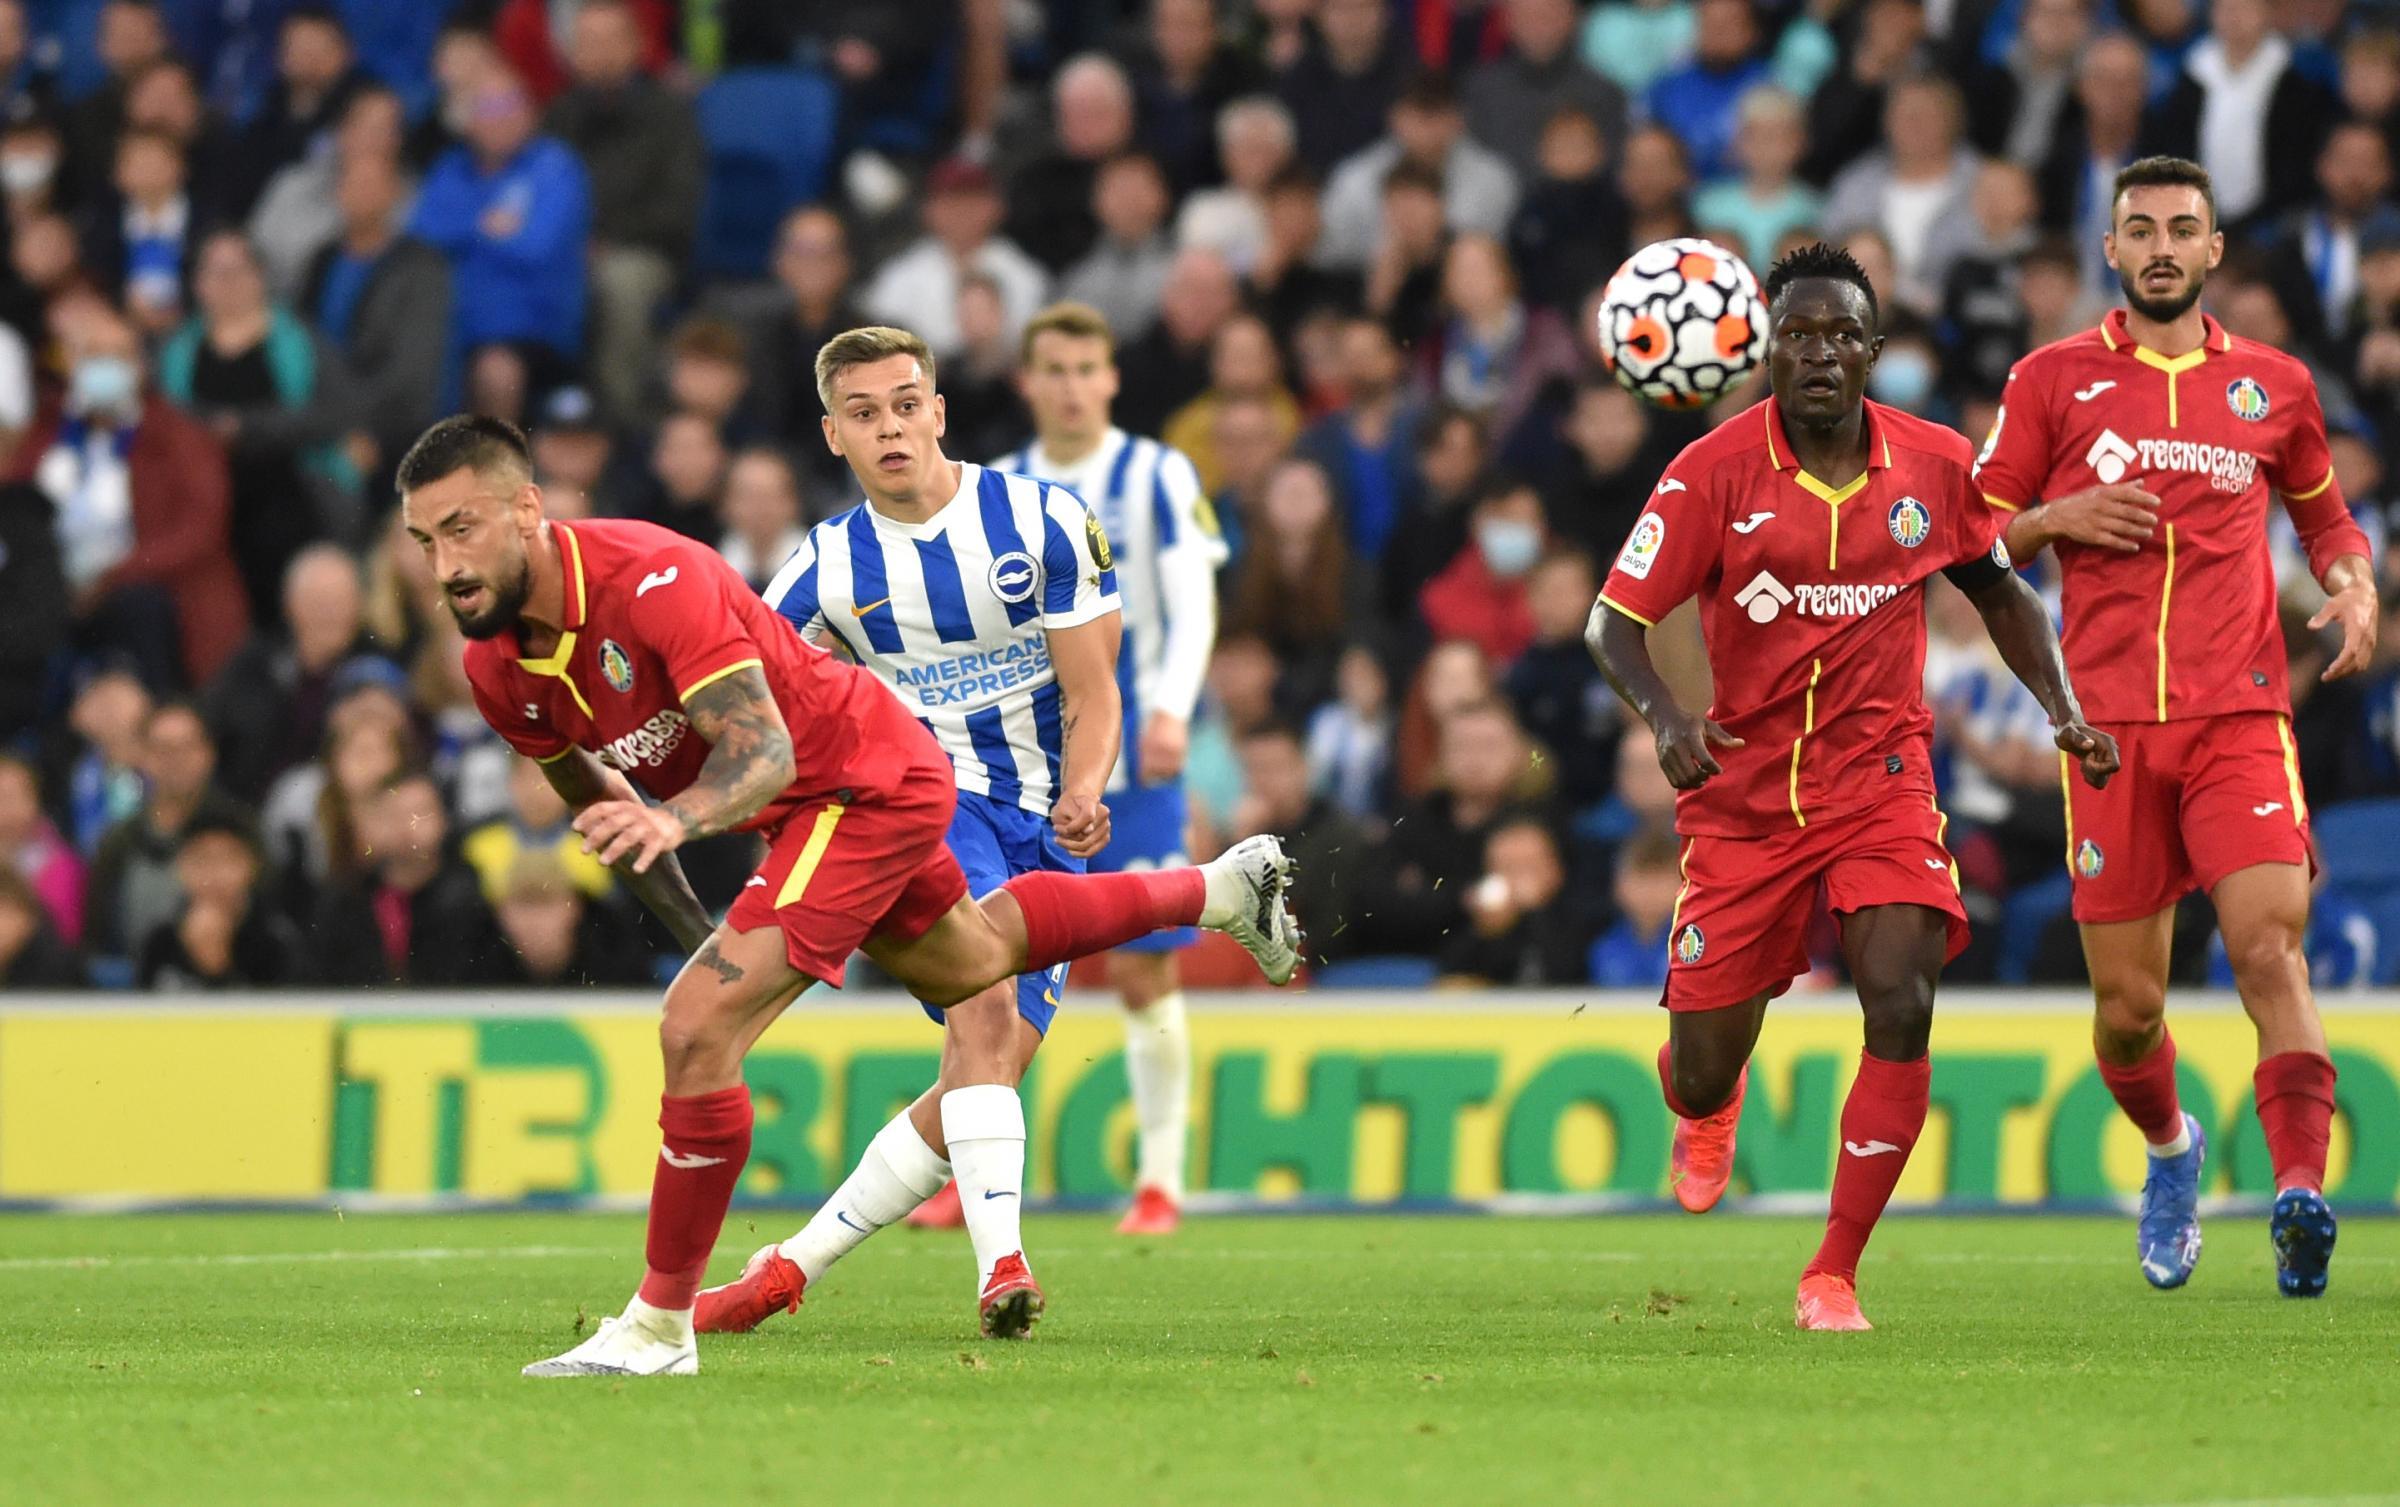 Brighton hope for more Leandro Trossard magic